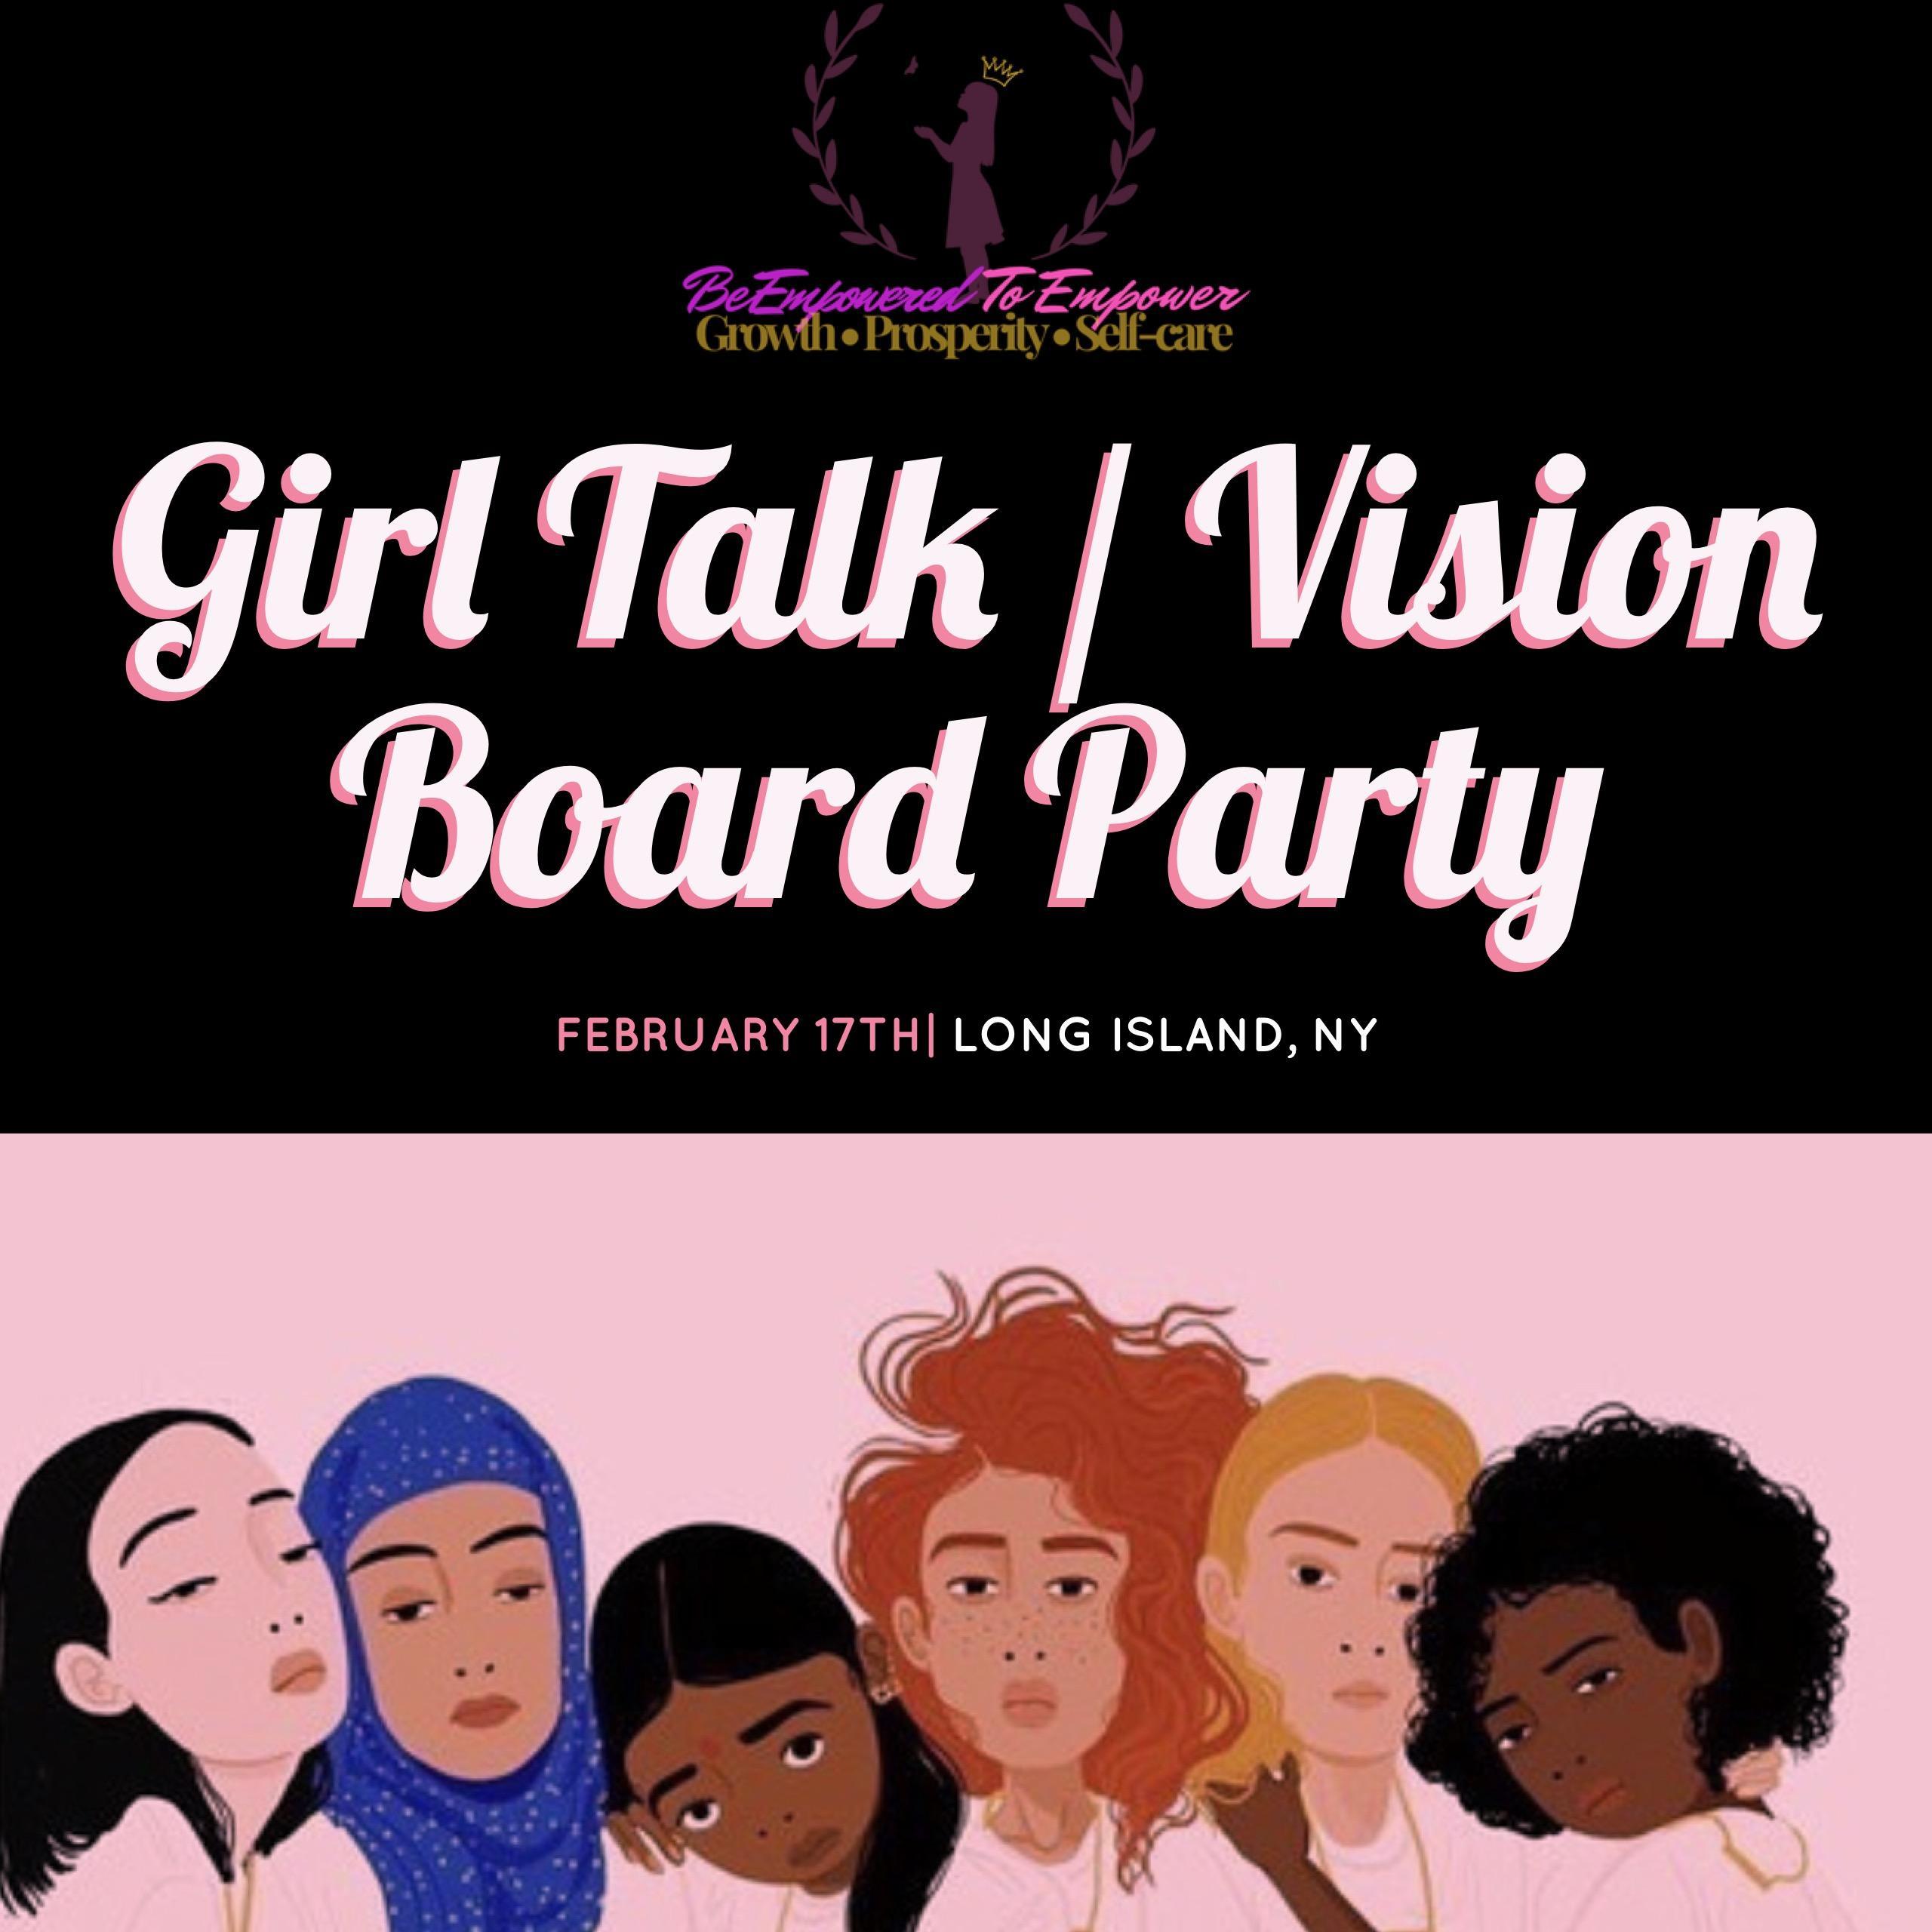 Girl Talk / Vision Board Party